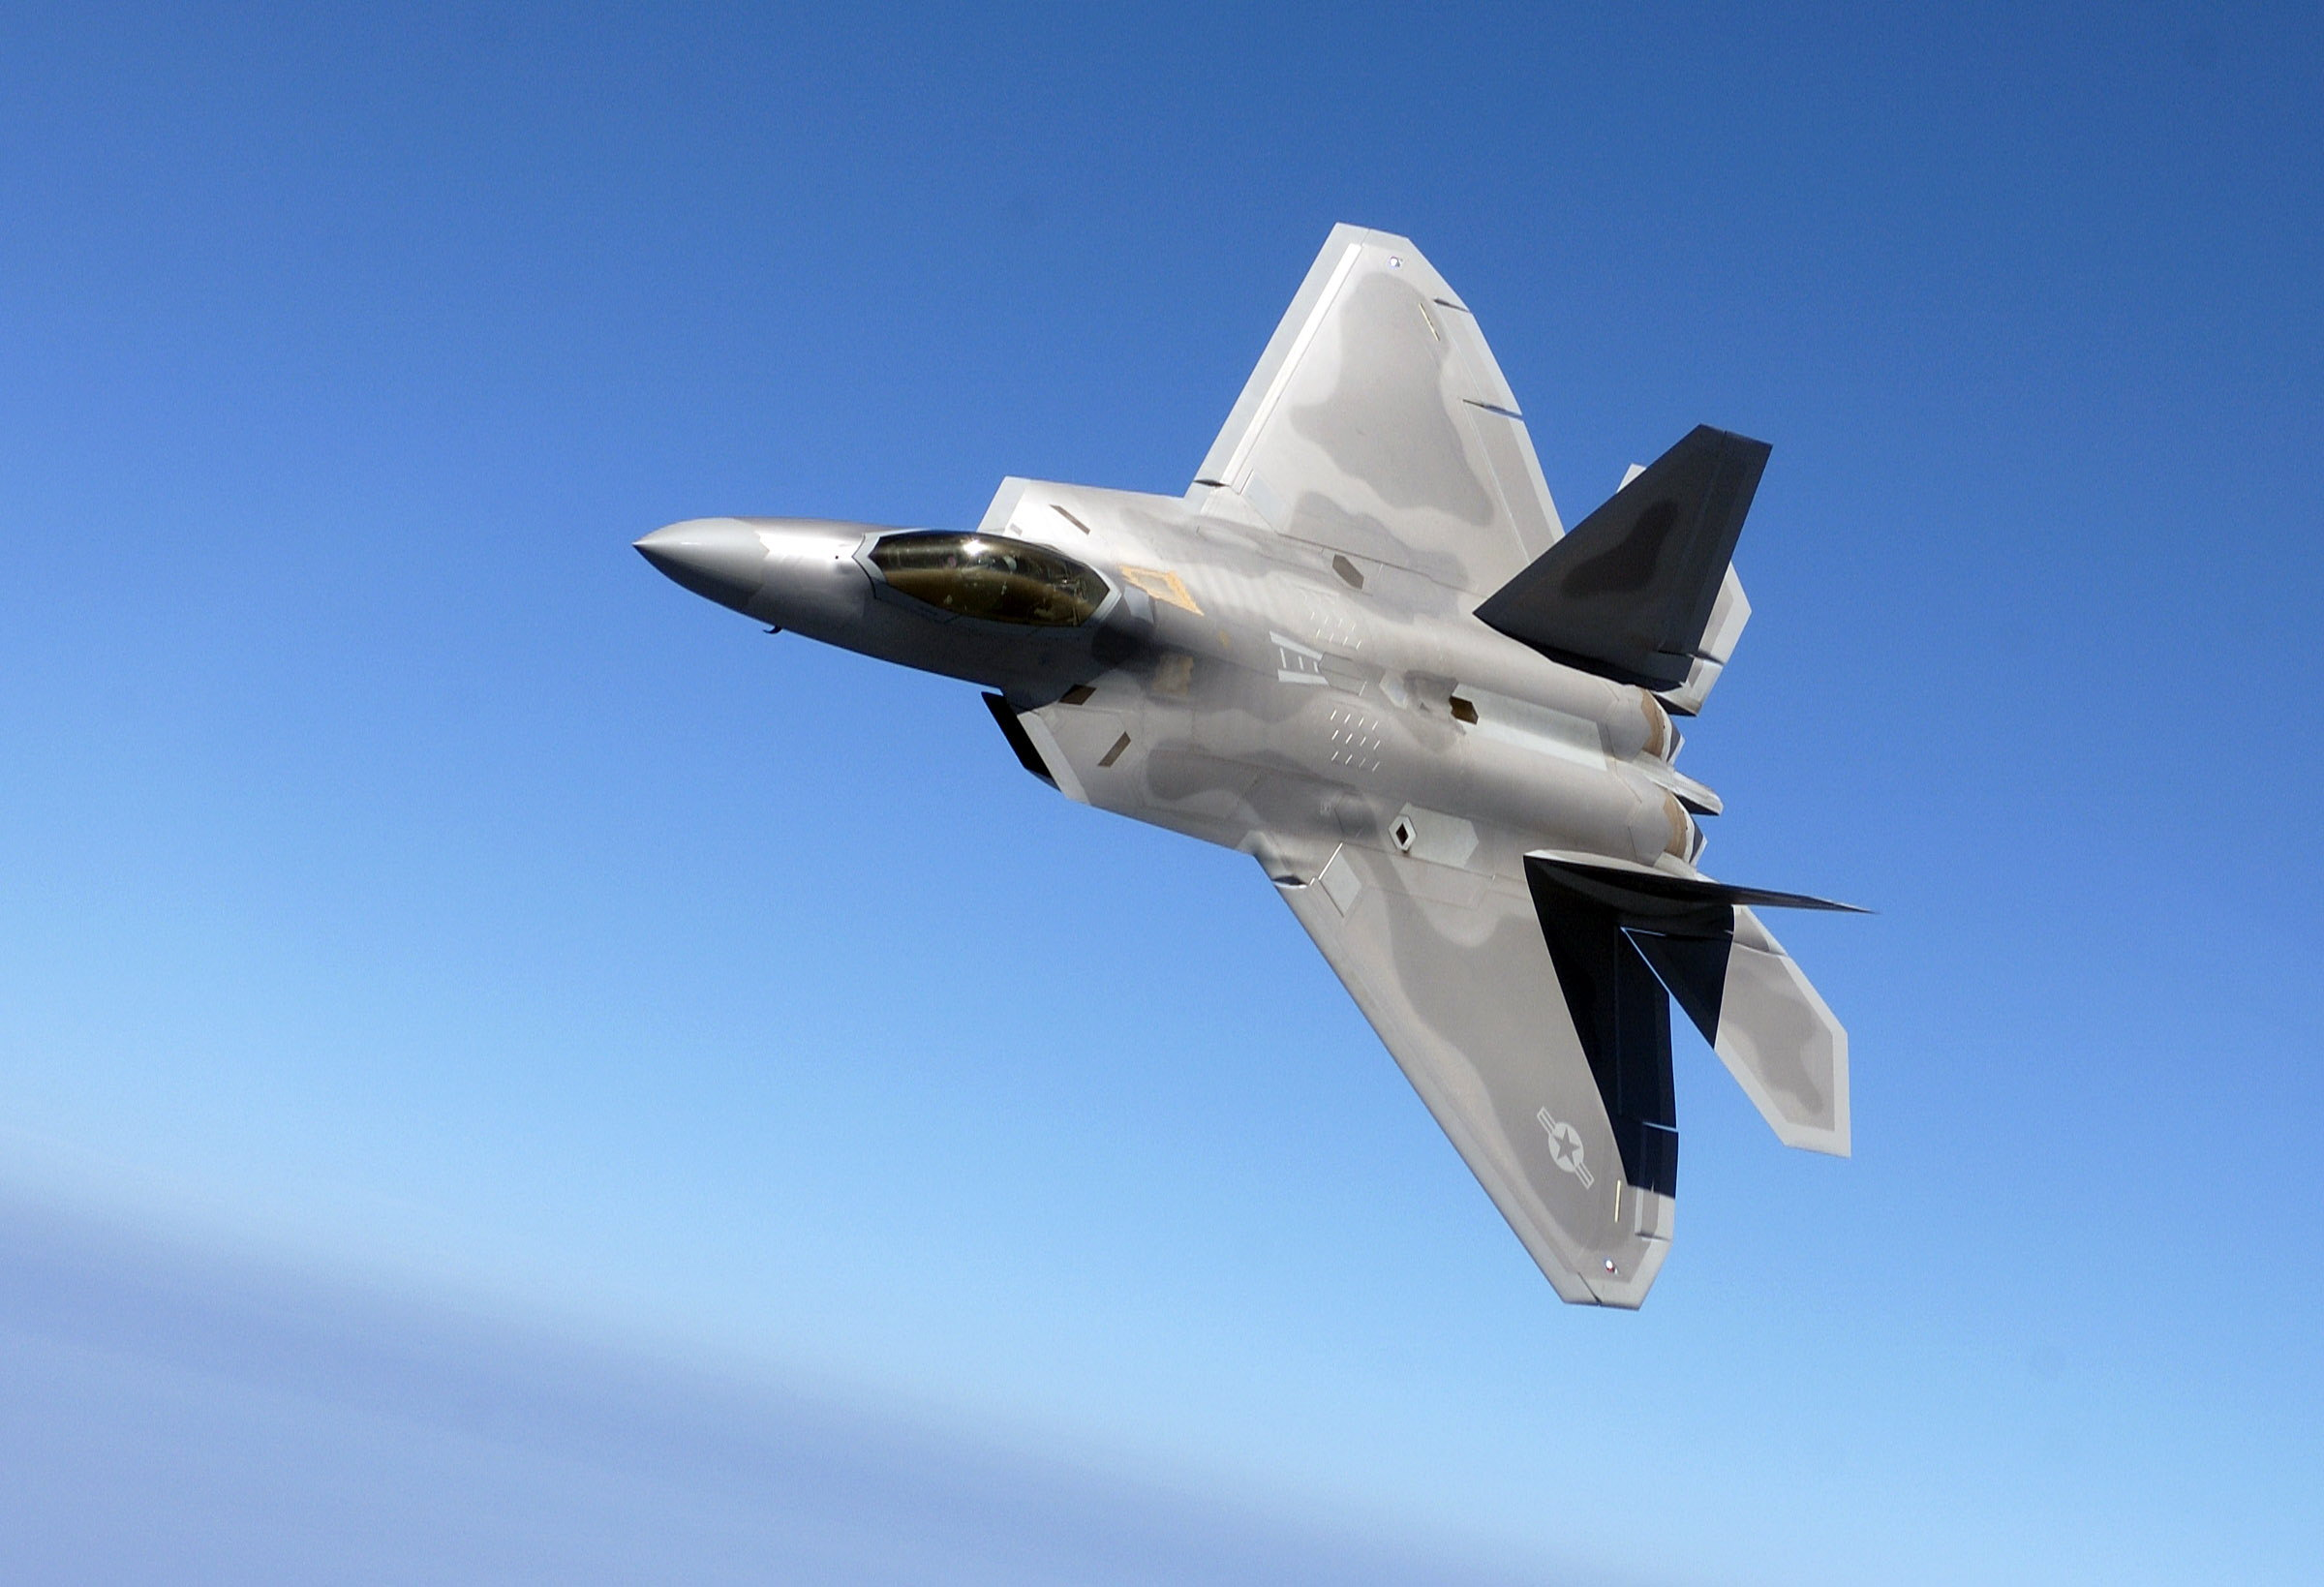 F-22 Raptor - Page 2 050812-F-2295B-147